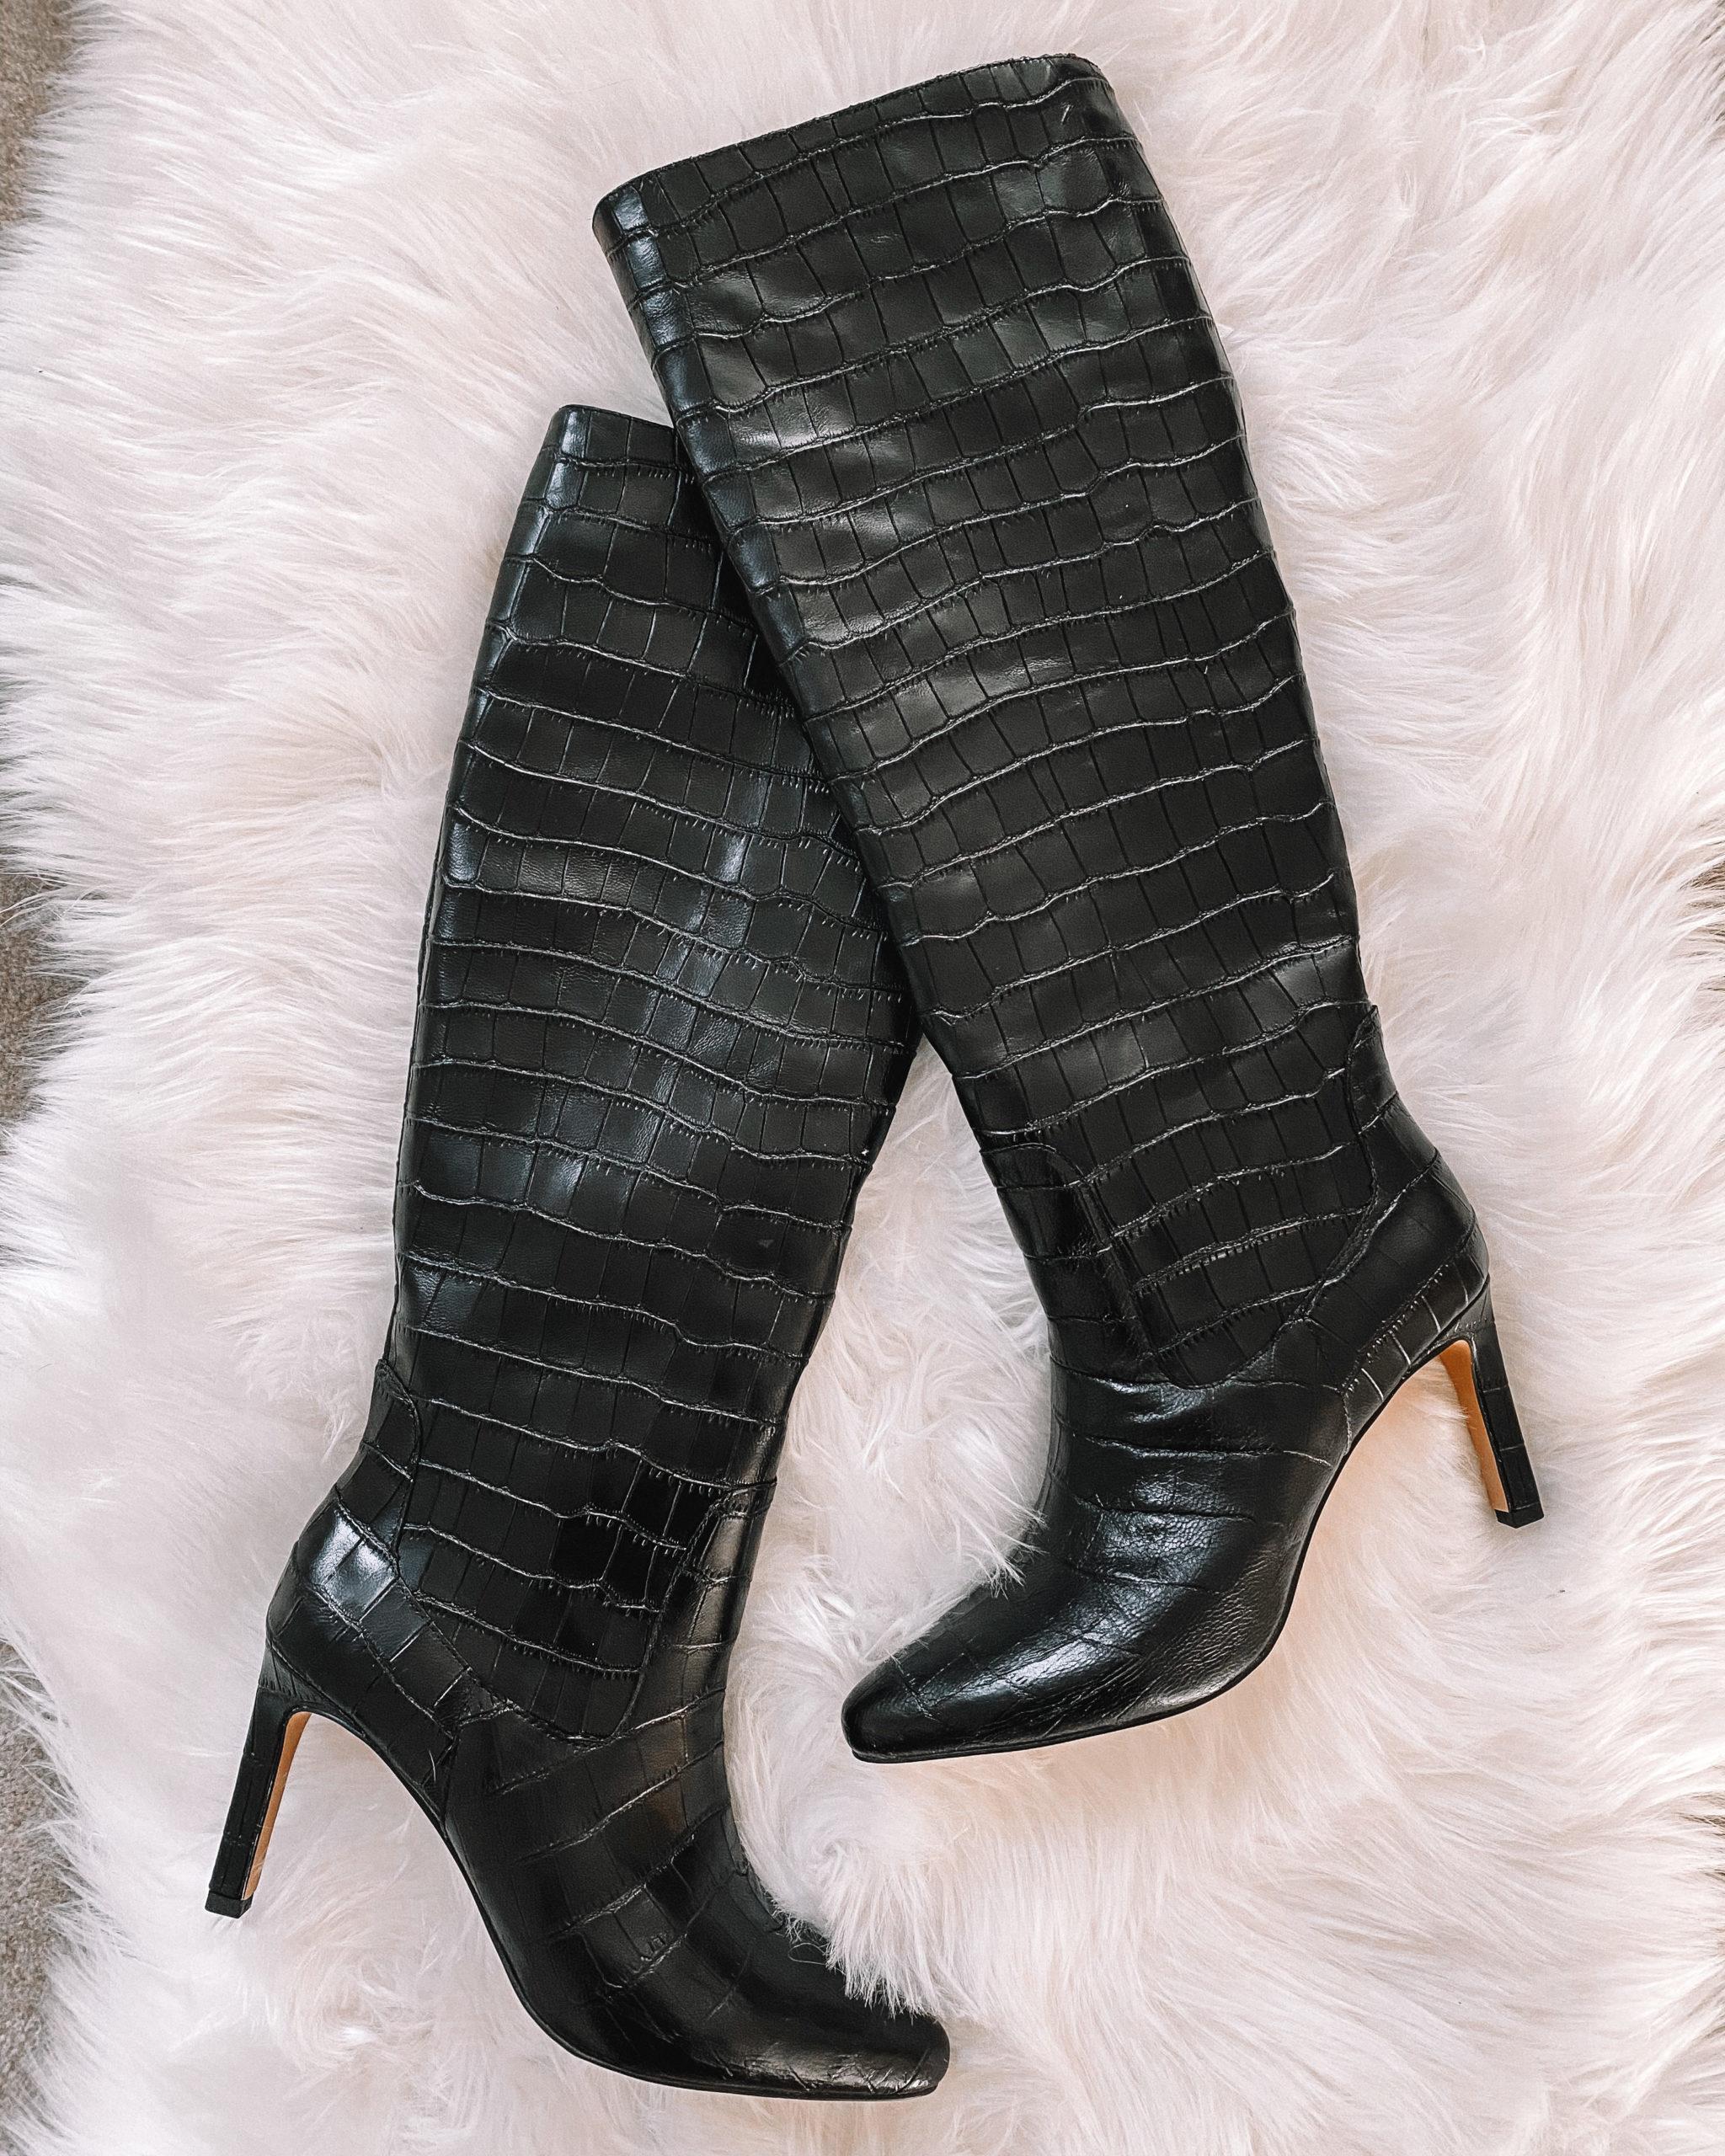 Fashion Jackson Black Croc Knee High Boots